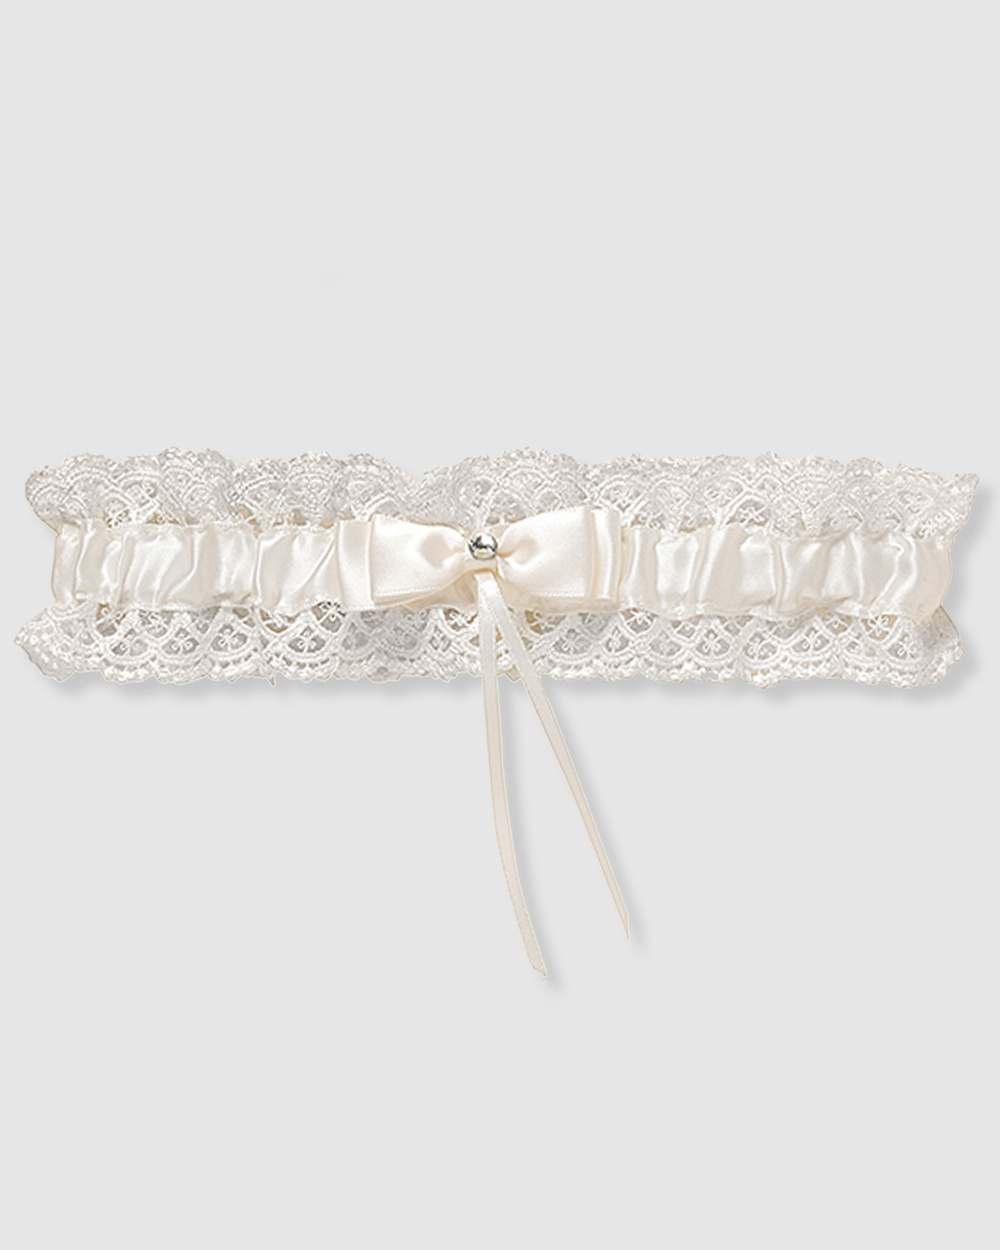 B Free Intimate Apparel Bridal Garter Vintage Lace Wedding & Ivory